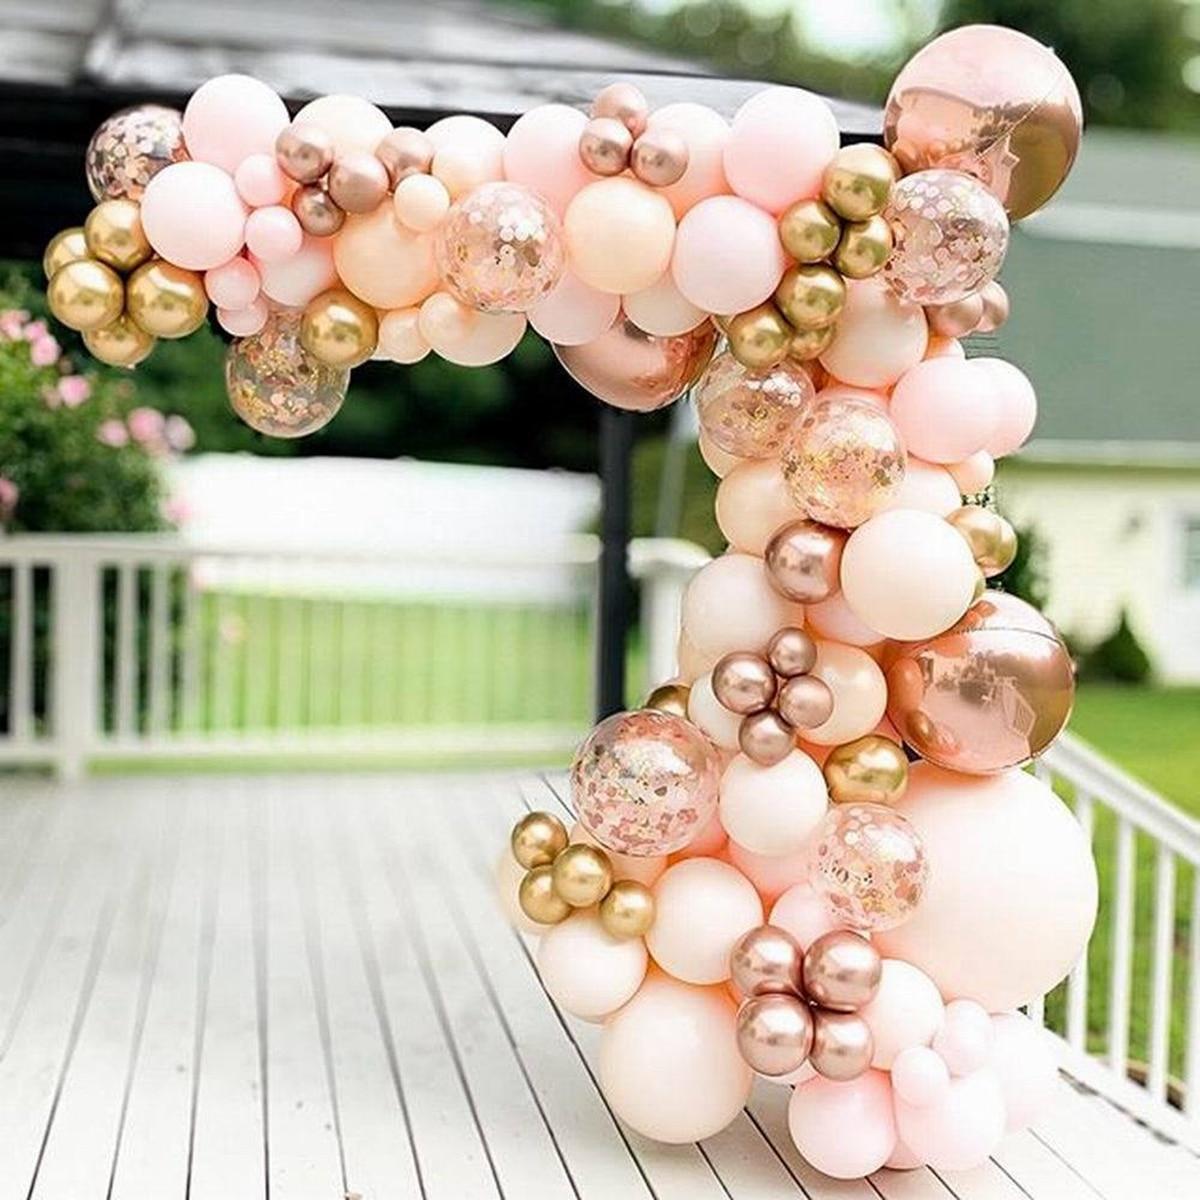 Macaron Pink Balloon Garland Arch Kit Wedding Birthday Party Decoration Kids Globos Rose Gold Confetti Latex Ballon Baby Shower 1